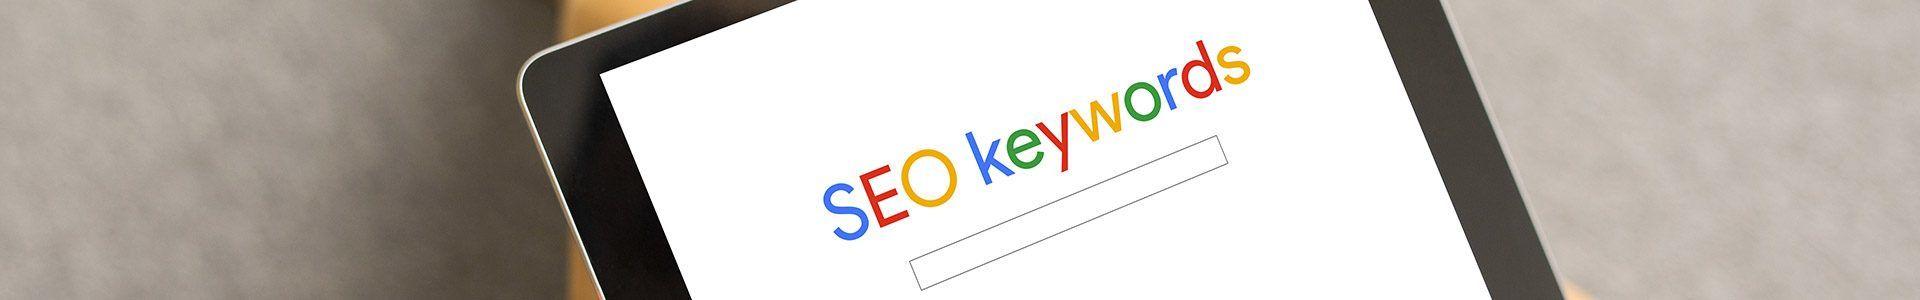 Dynamic Search Ads in Google: van meer bereik tot rechtszaak